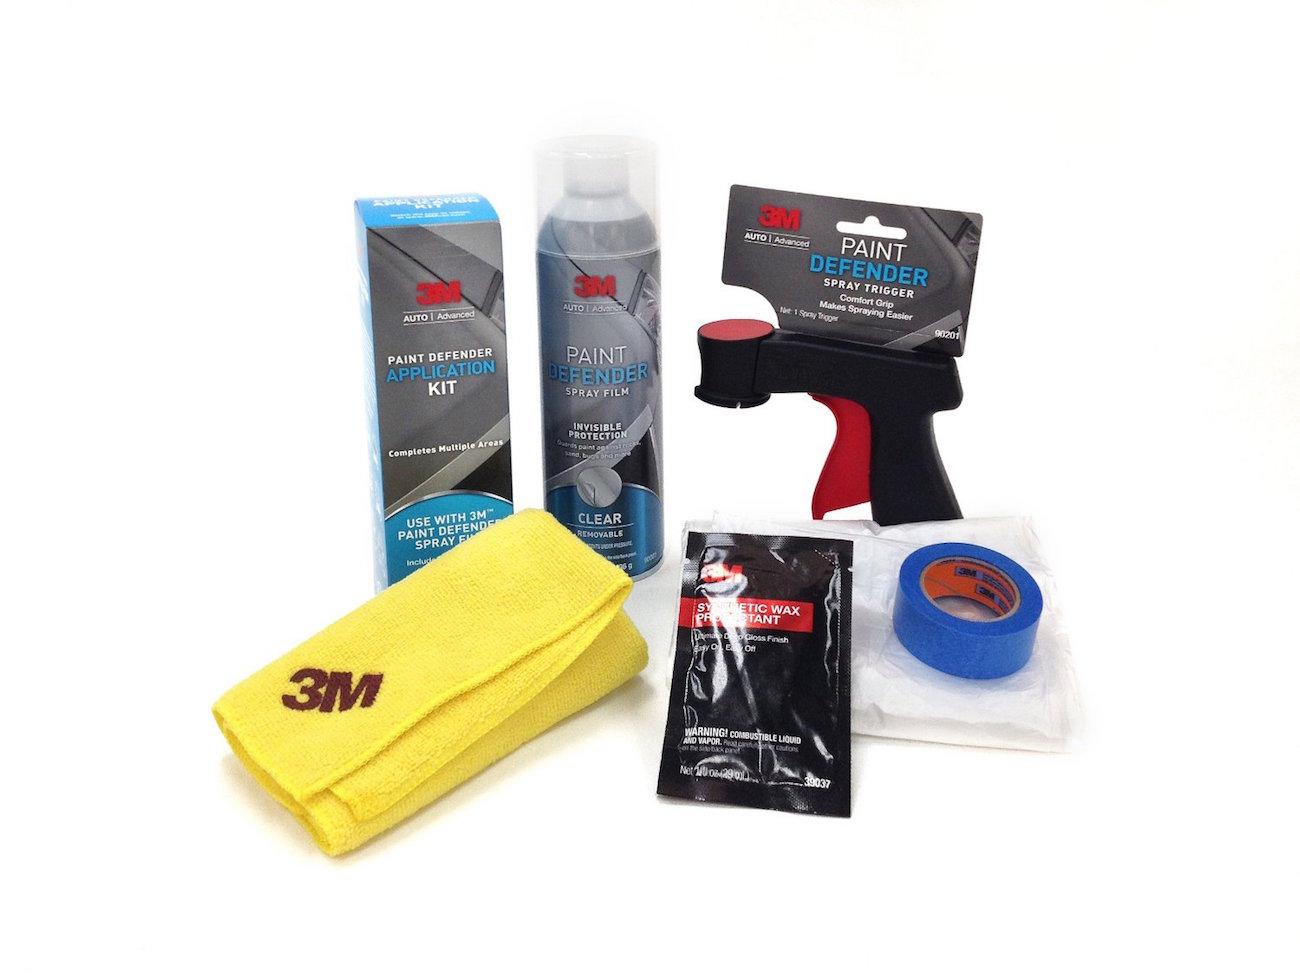 3M Paint Defender System